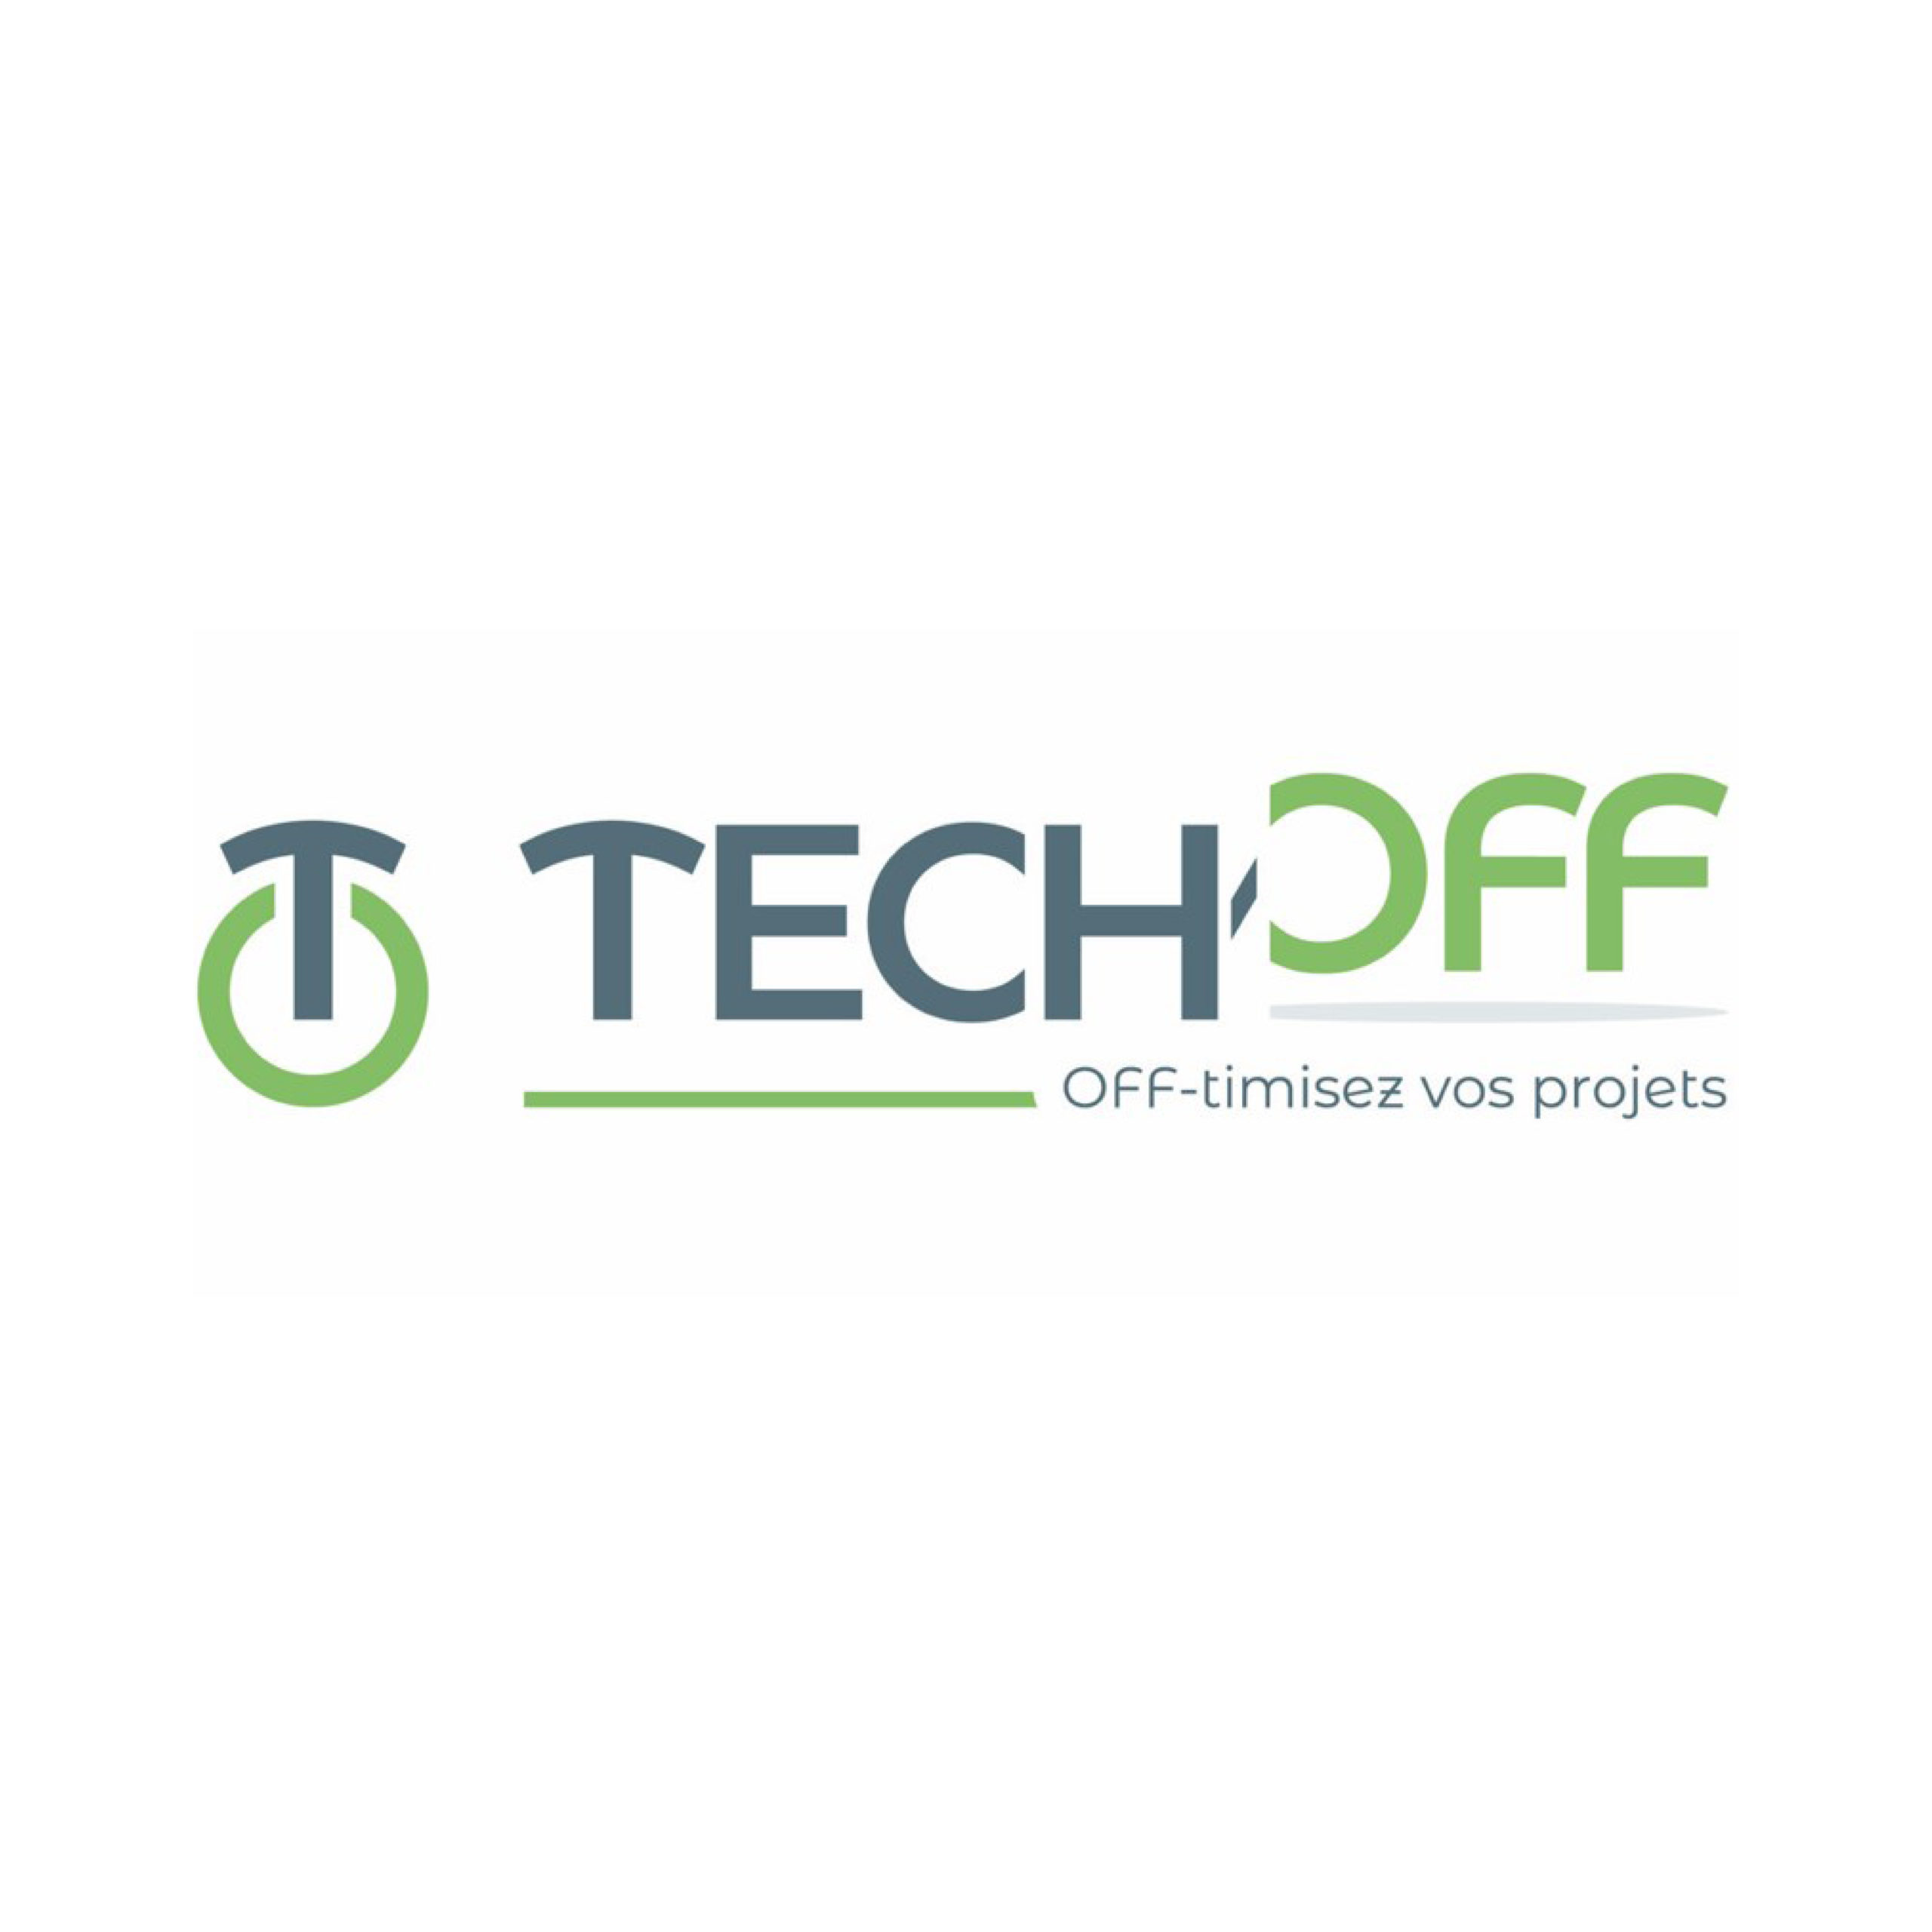 Techoff